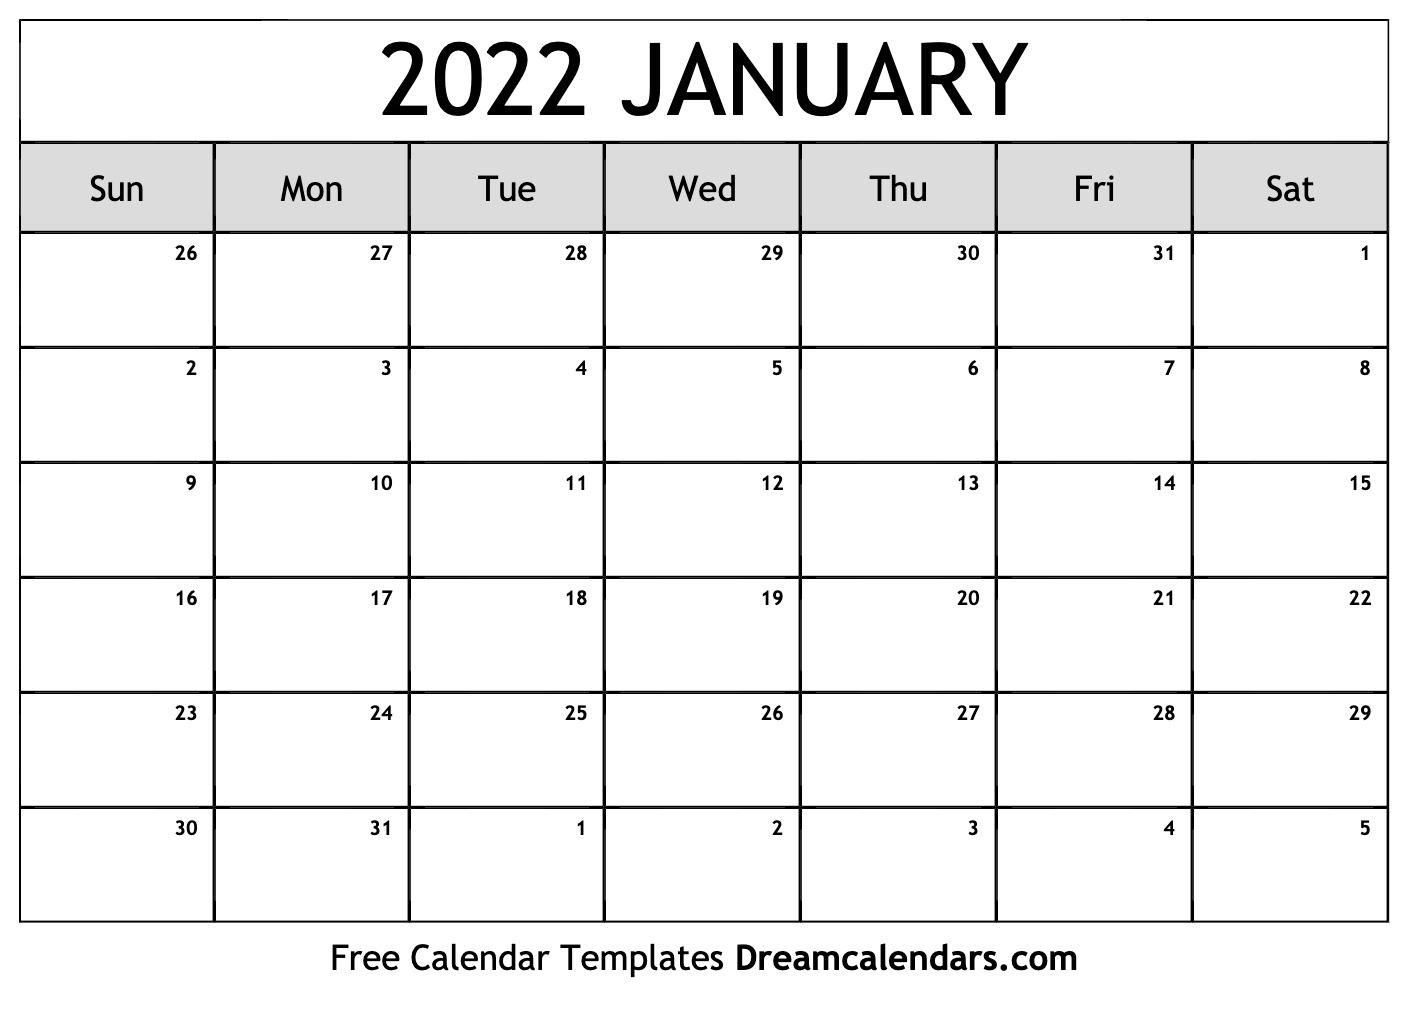 January 2022 Calendar   Free Blank Printable Templates Regarding 2022 January Calendar With Holidays